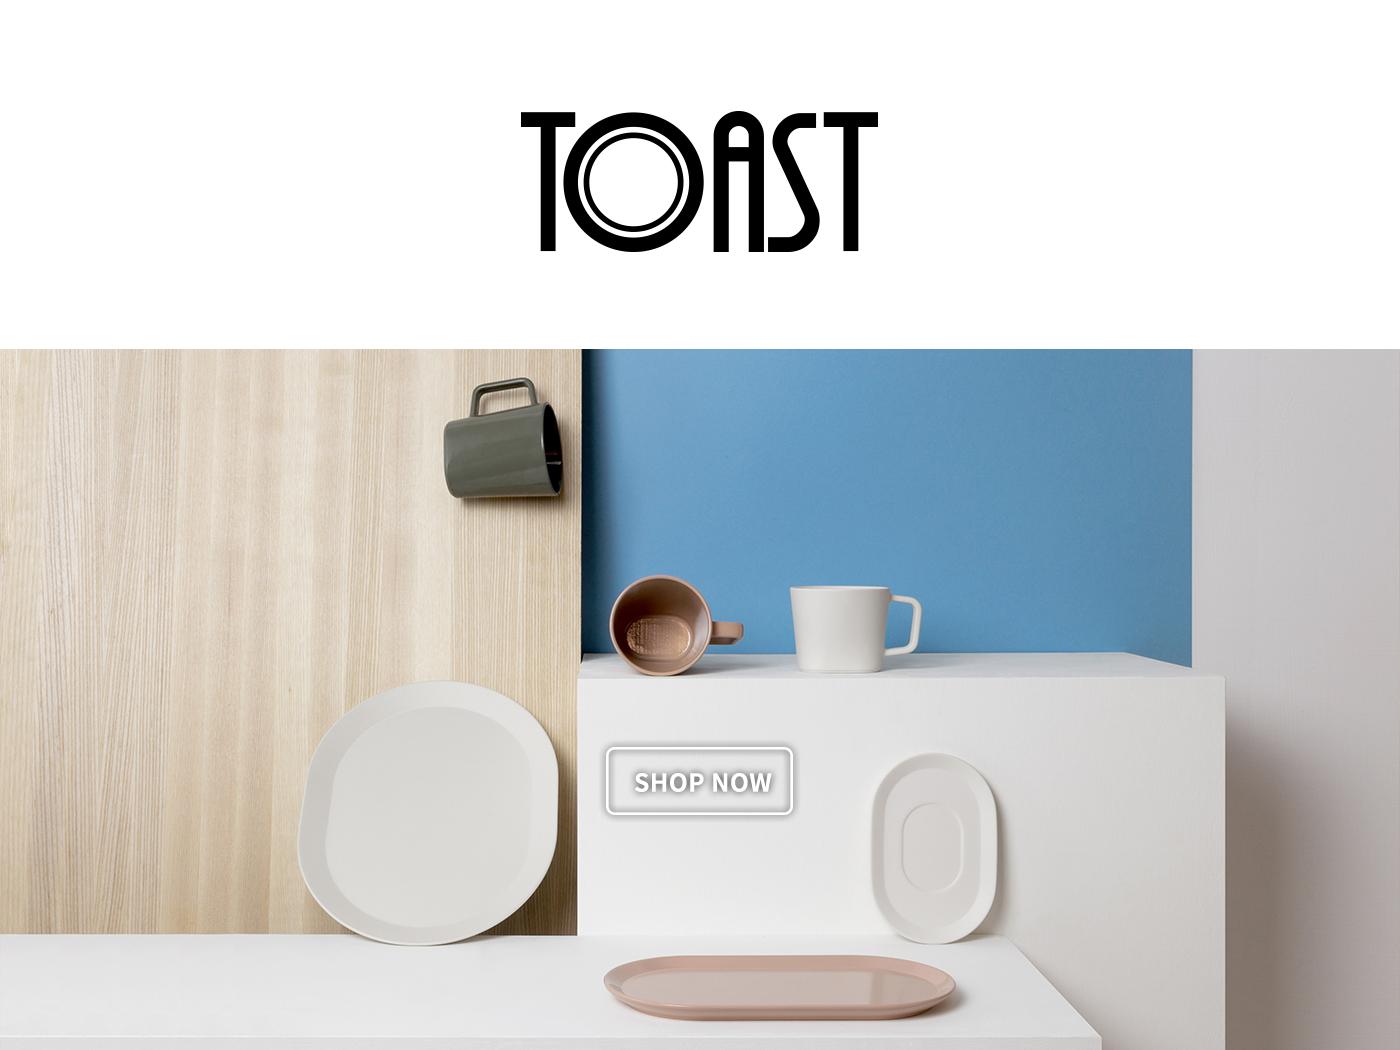 toast living,toast living 台湾,toast living taiwan,toast living 設計家居商品,toast living diffuser